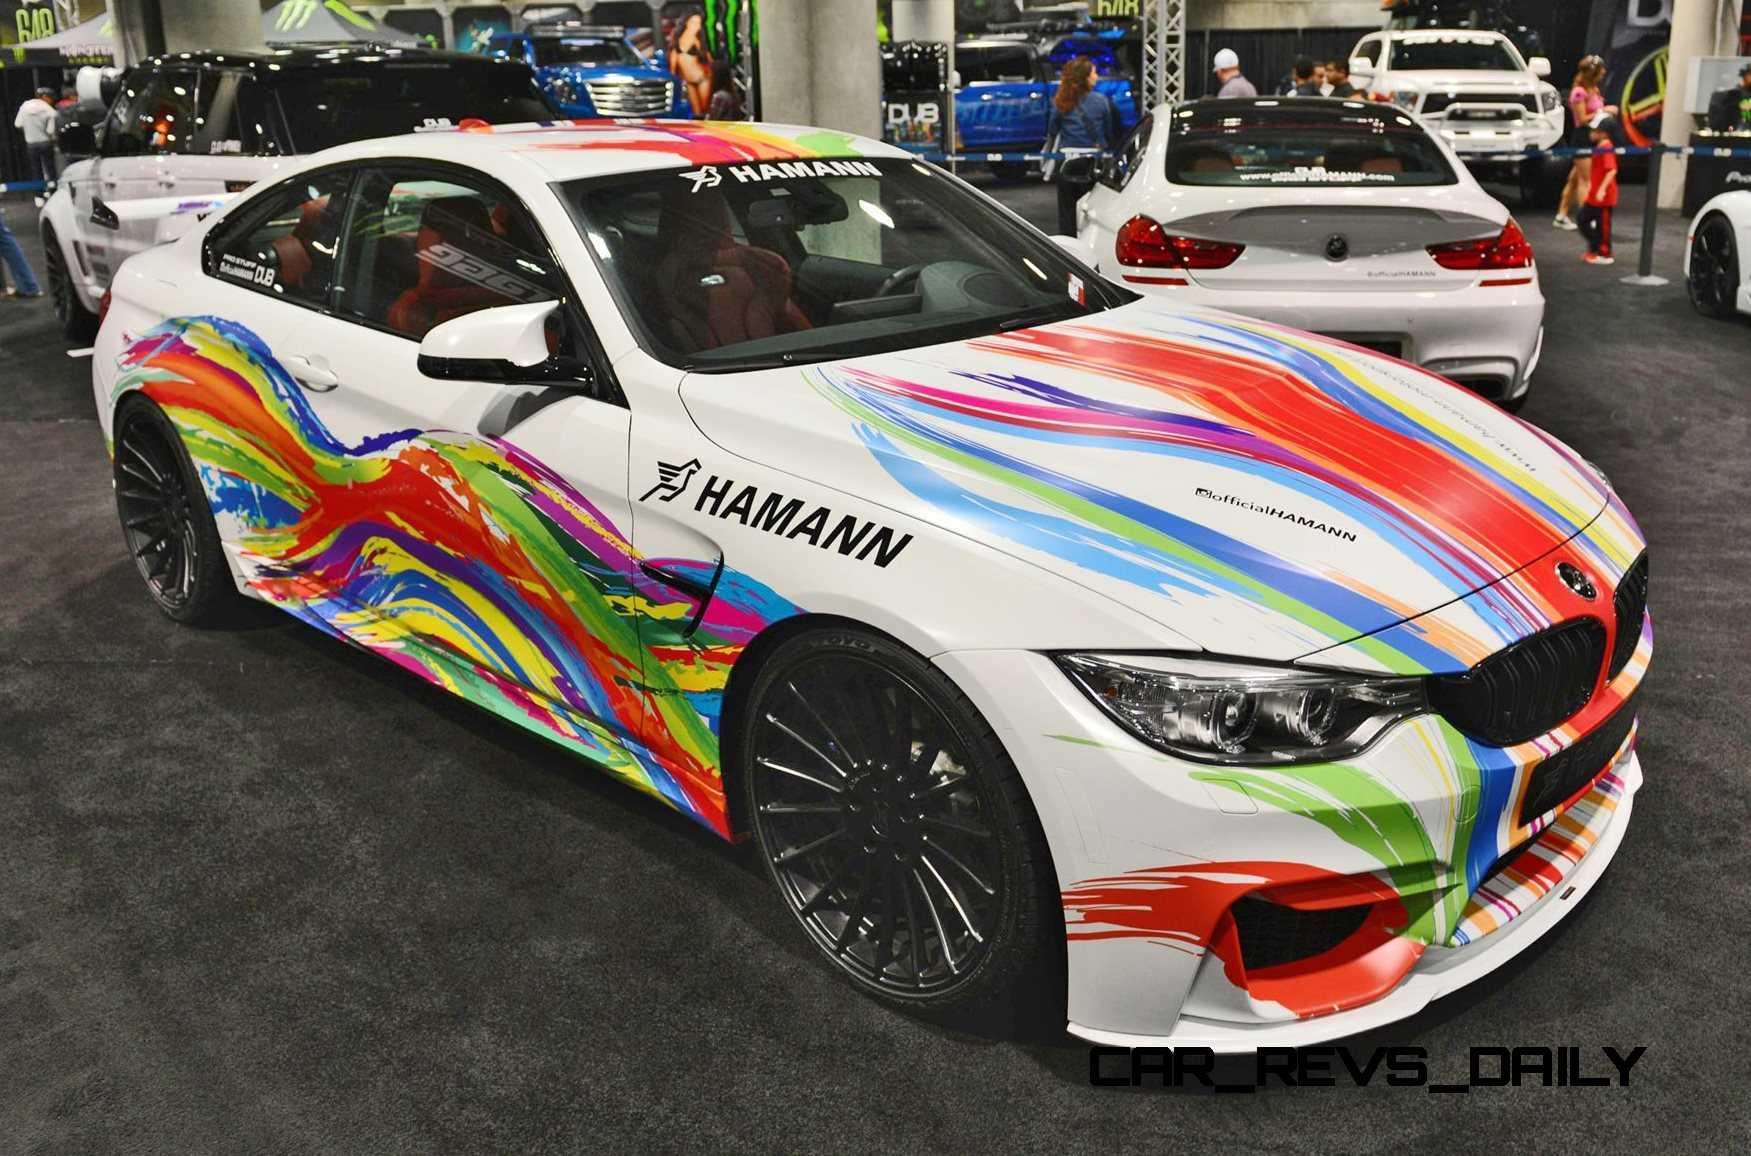 HAMANN BMW M Art Cars - Bmw 2015 cars